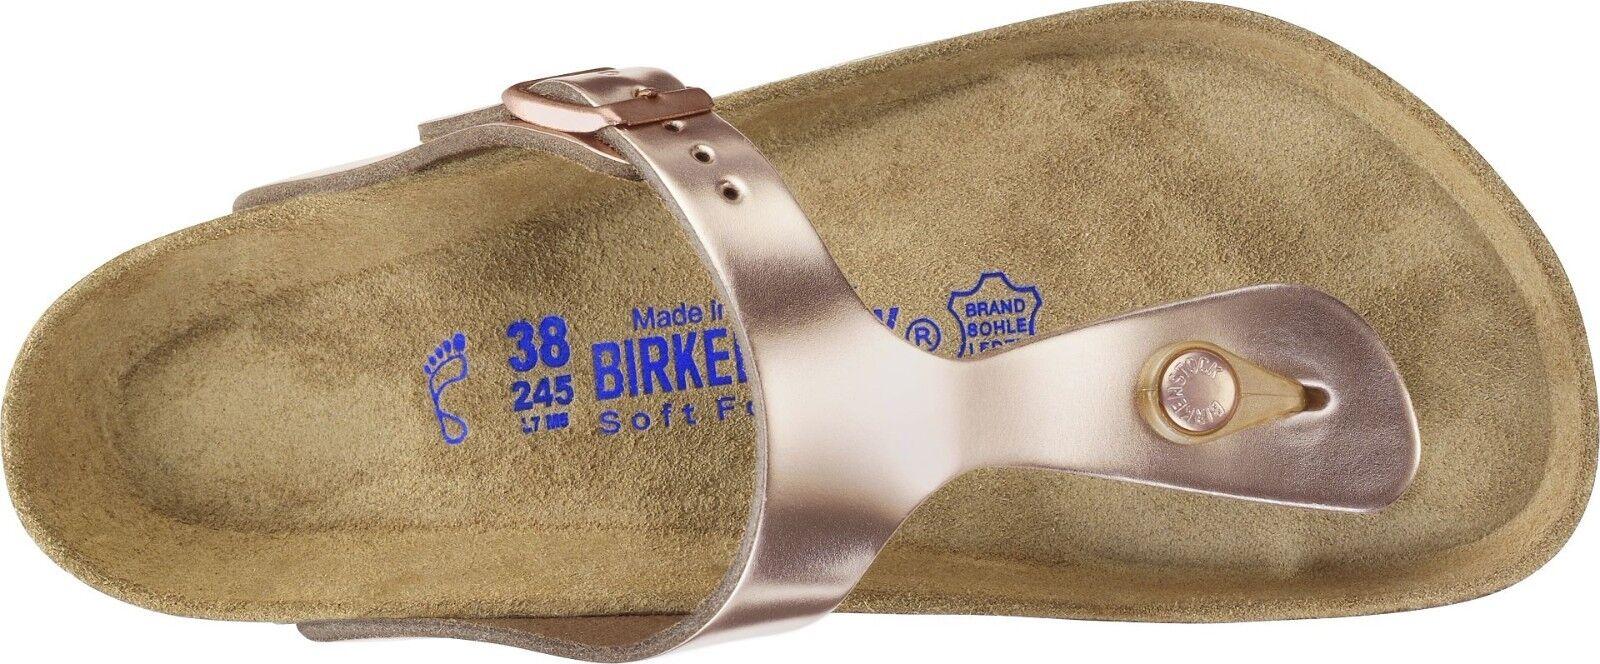 Birkenstock Gizeh Metallic Normal Copper Weichbettung Normal Metallic in 35,36,37,38,39,40,41,42 b9d82e